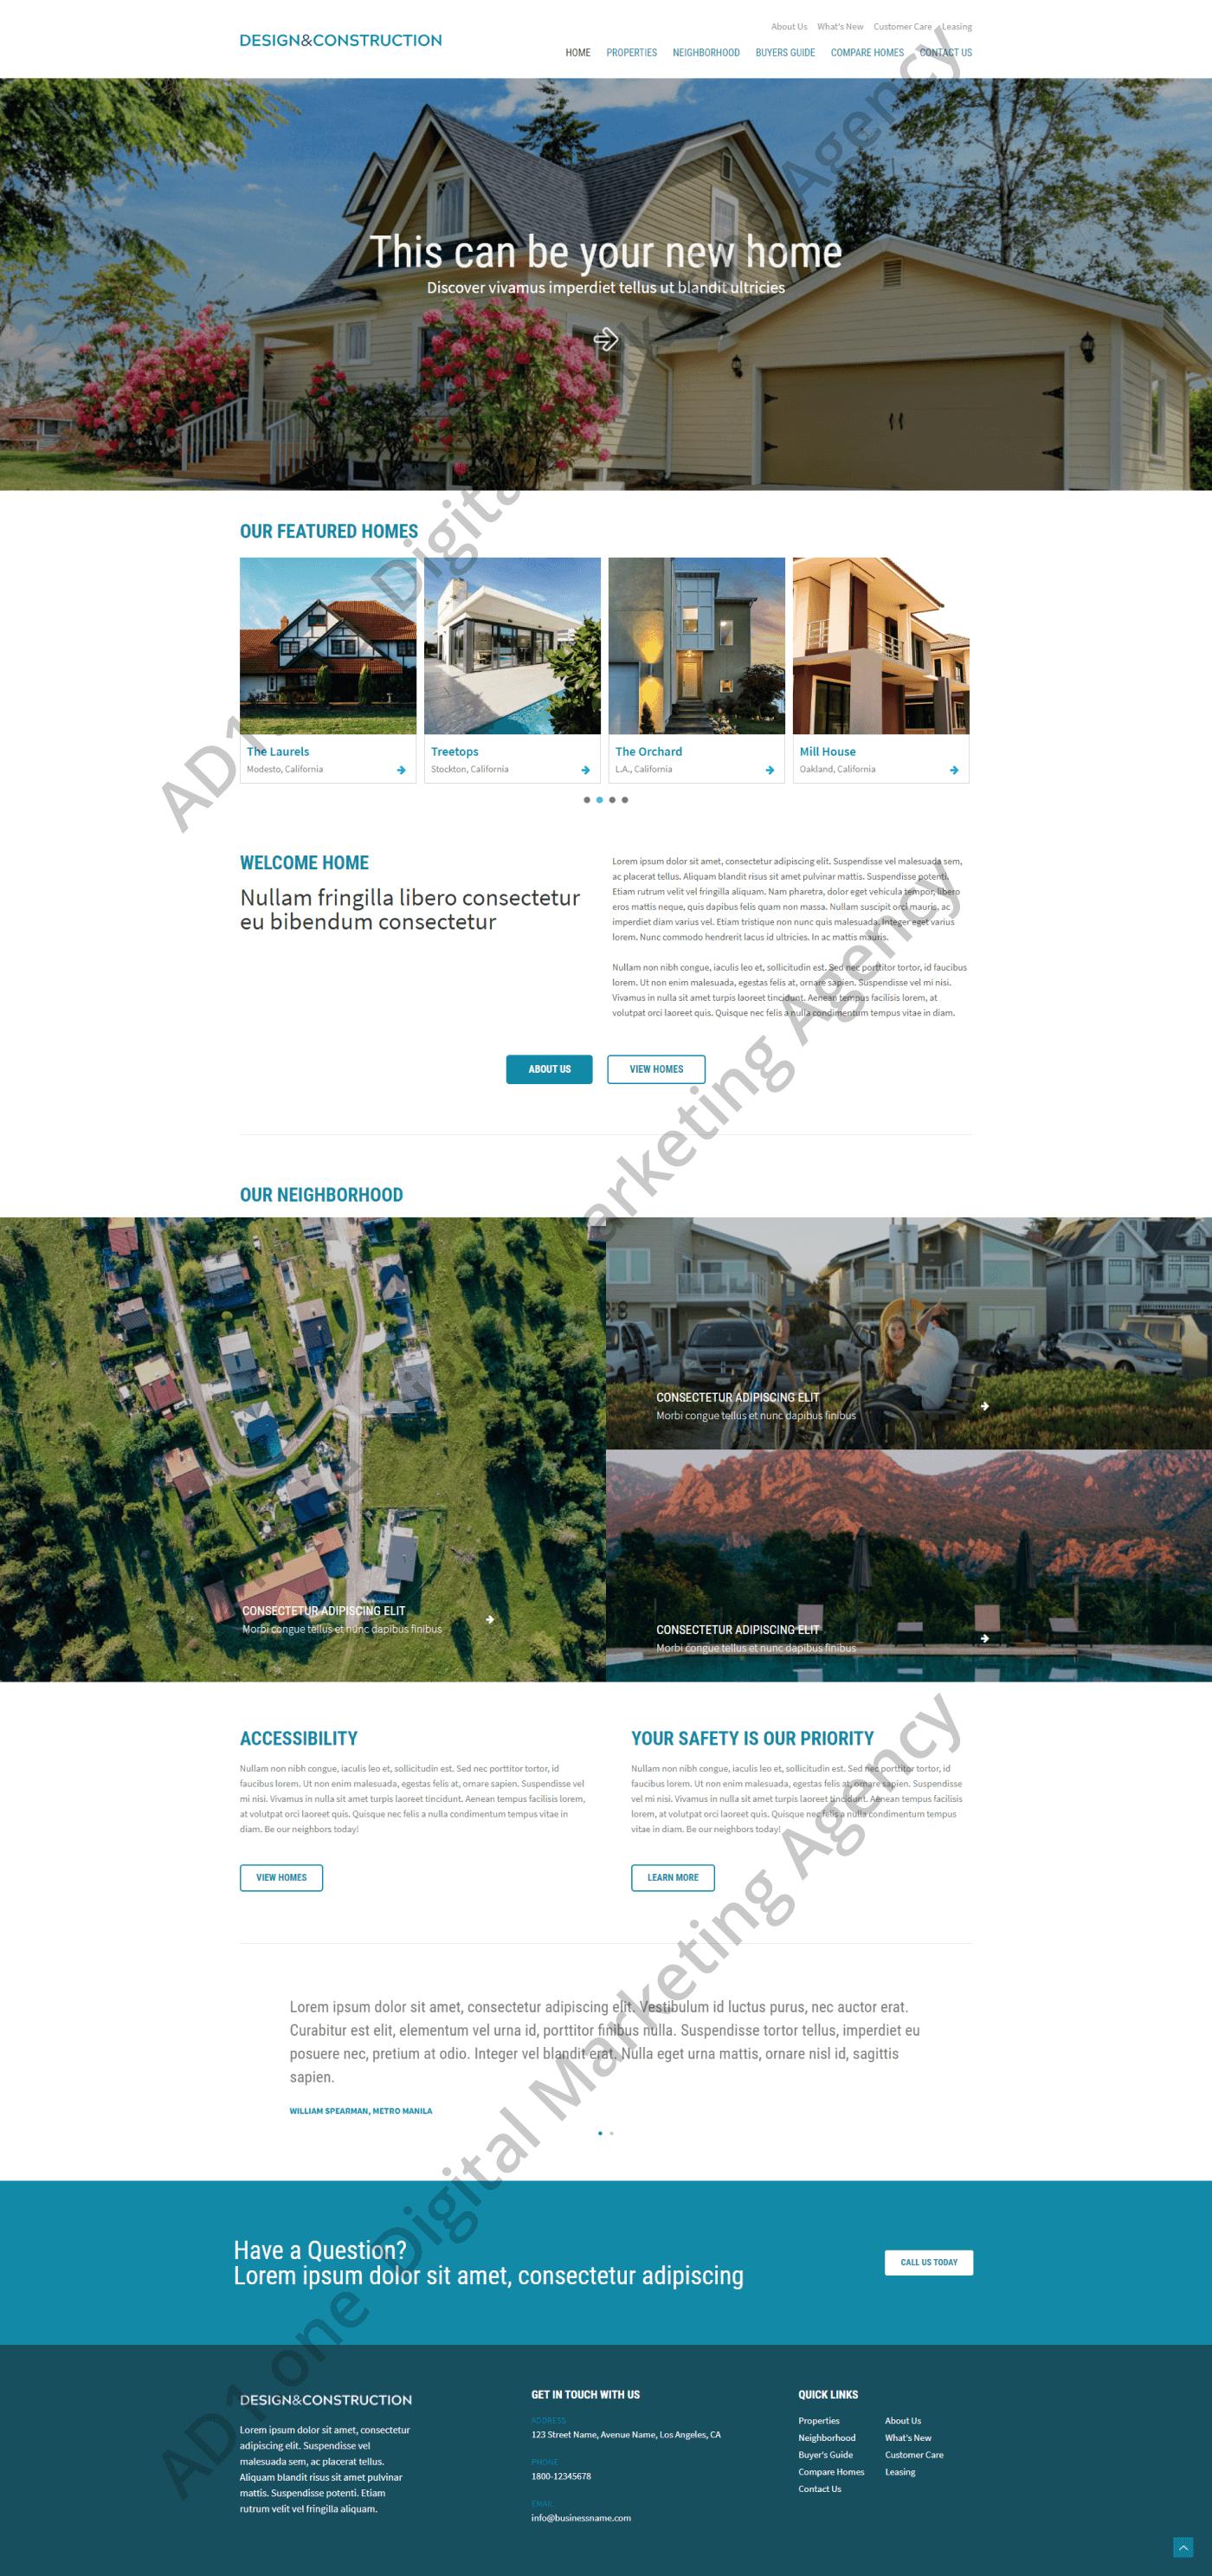 Magnolia- ad1 agency website desing project